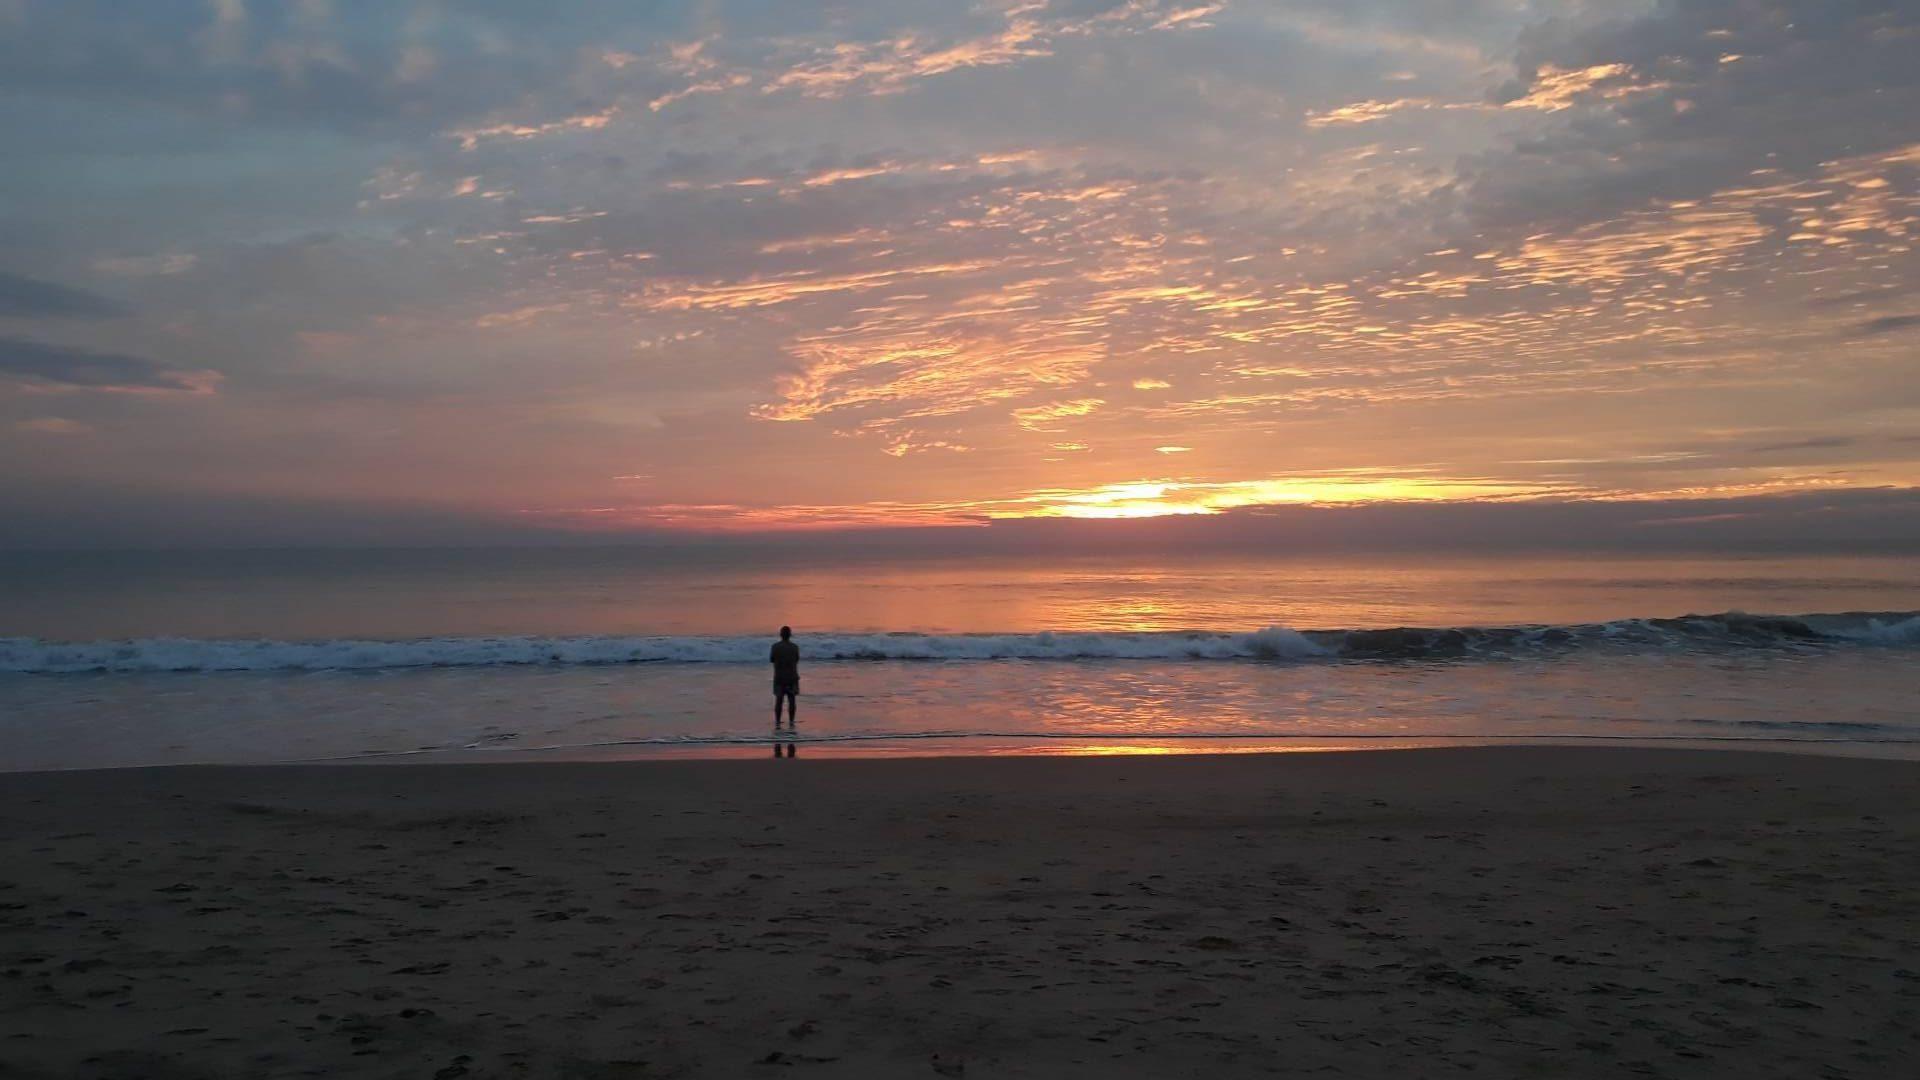 Sunset, Galgibaga Beach, Goa, India